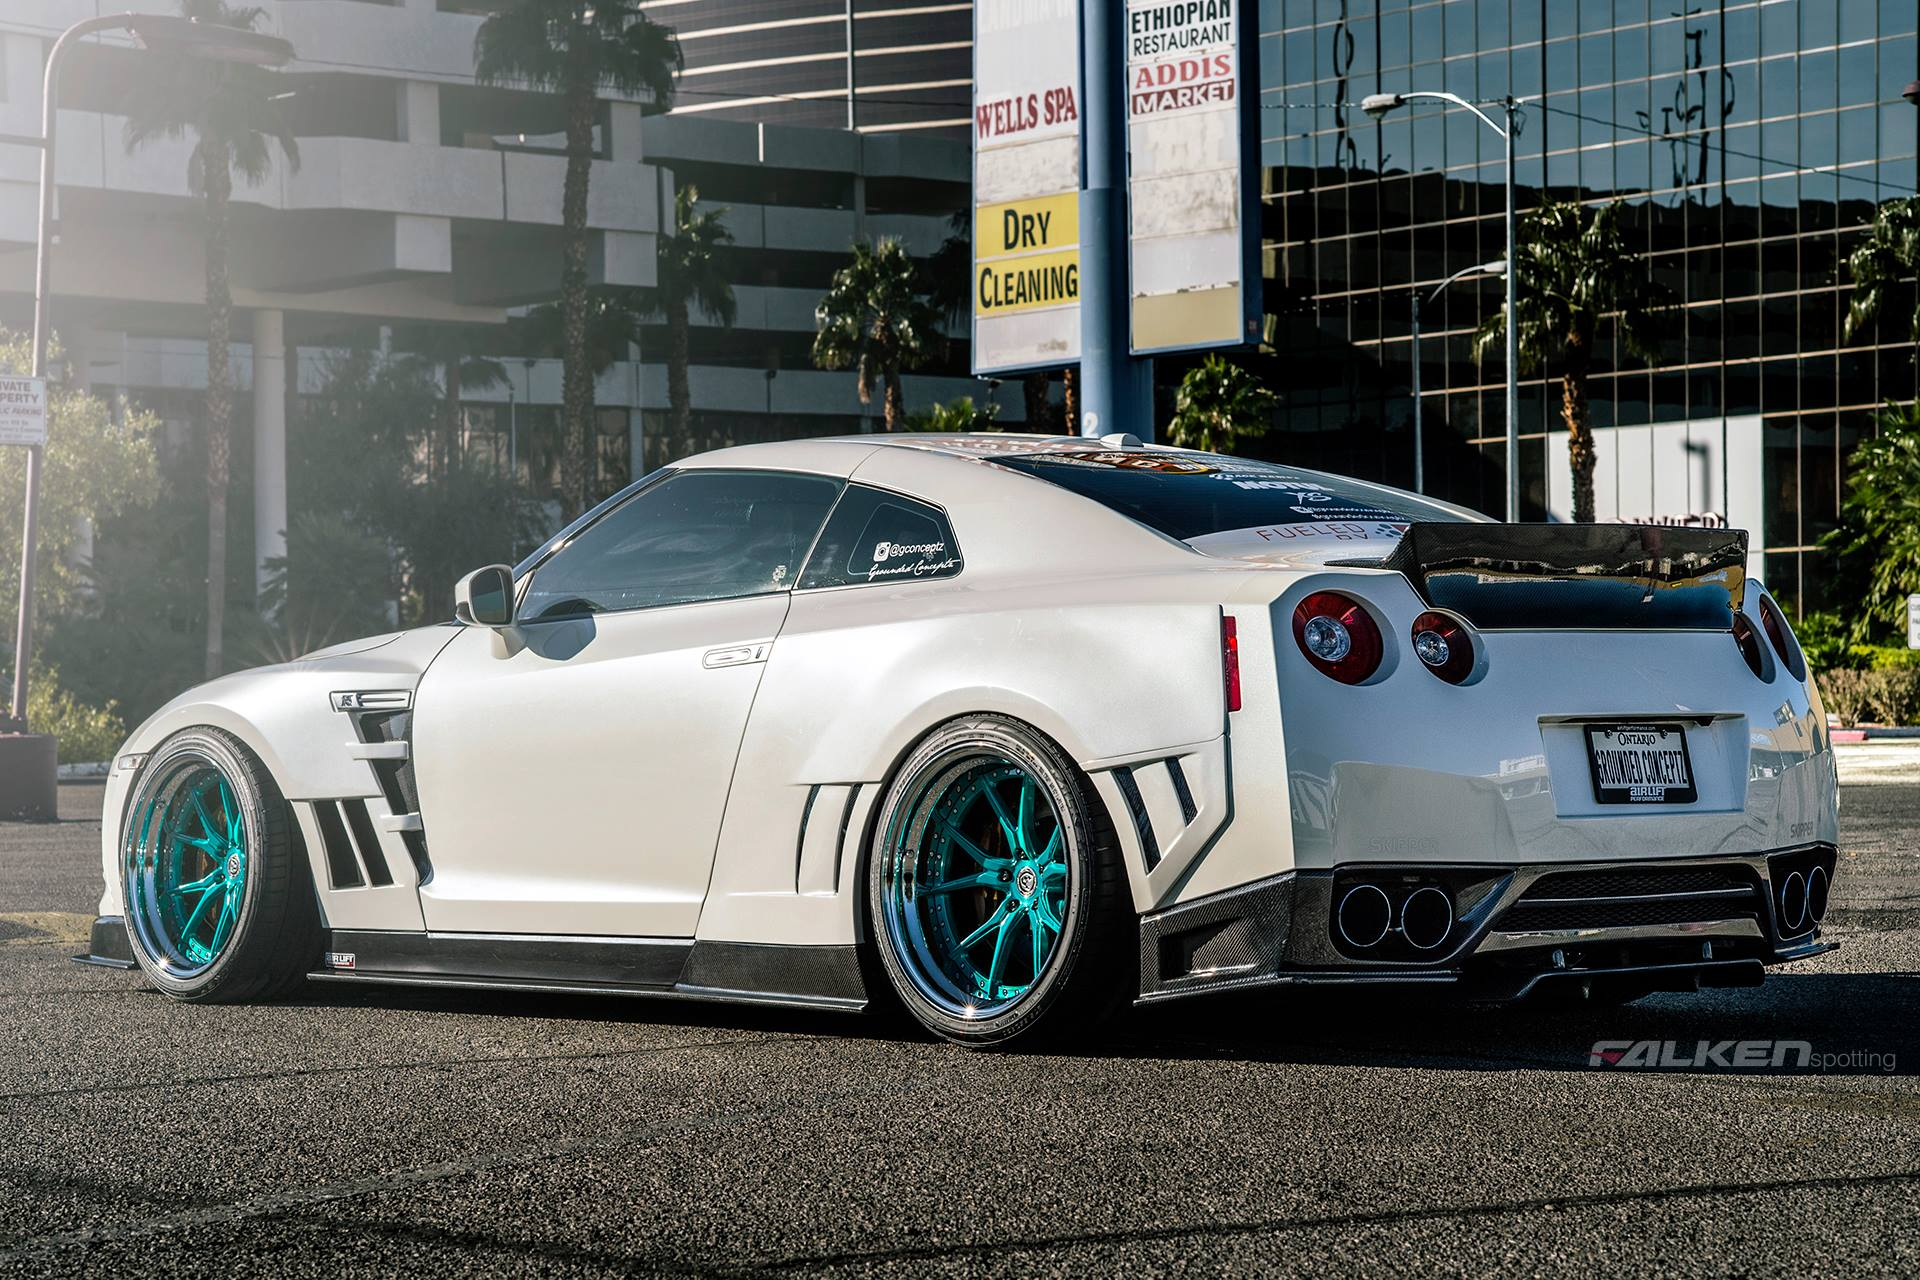 Nissan GT-R R35 Nismo - HisPotion